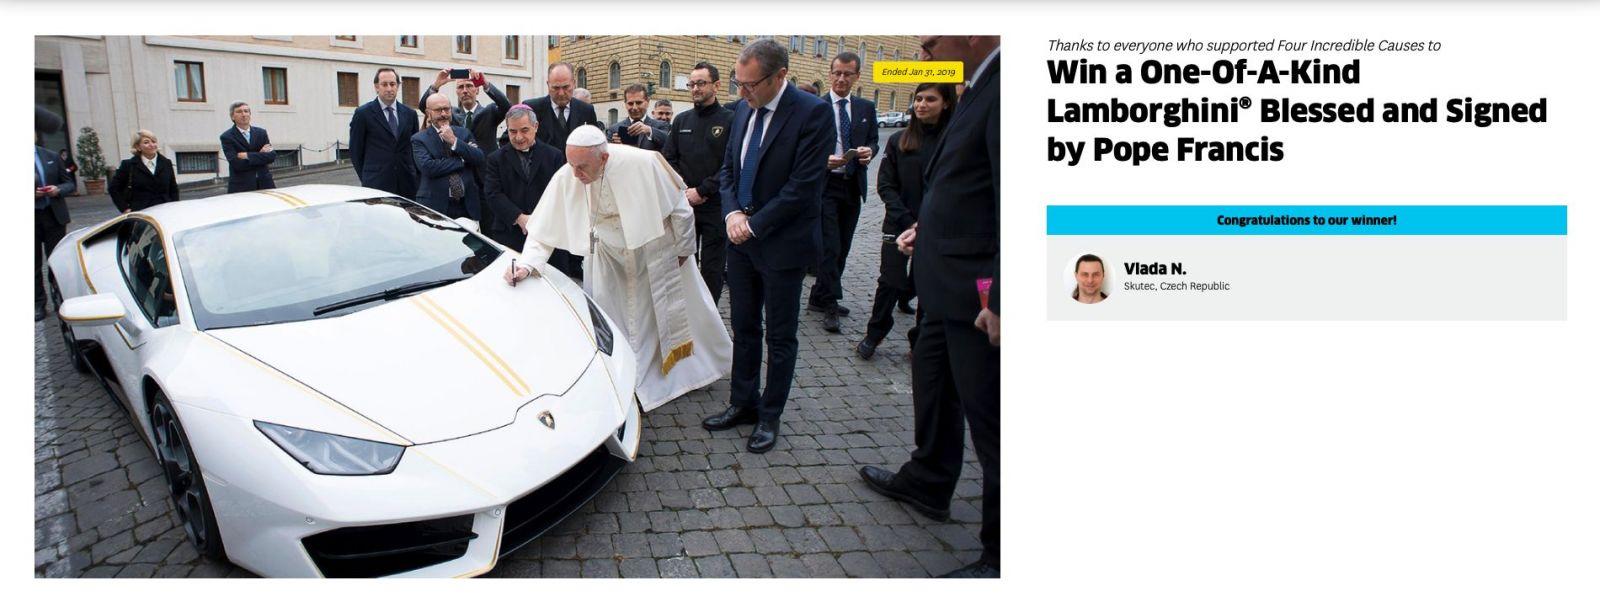 Papežovo Lamborghini putuje do Česka! V loterii jej vyhrál Vladislav z Pardubicka